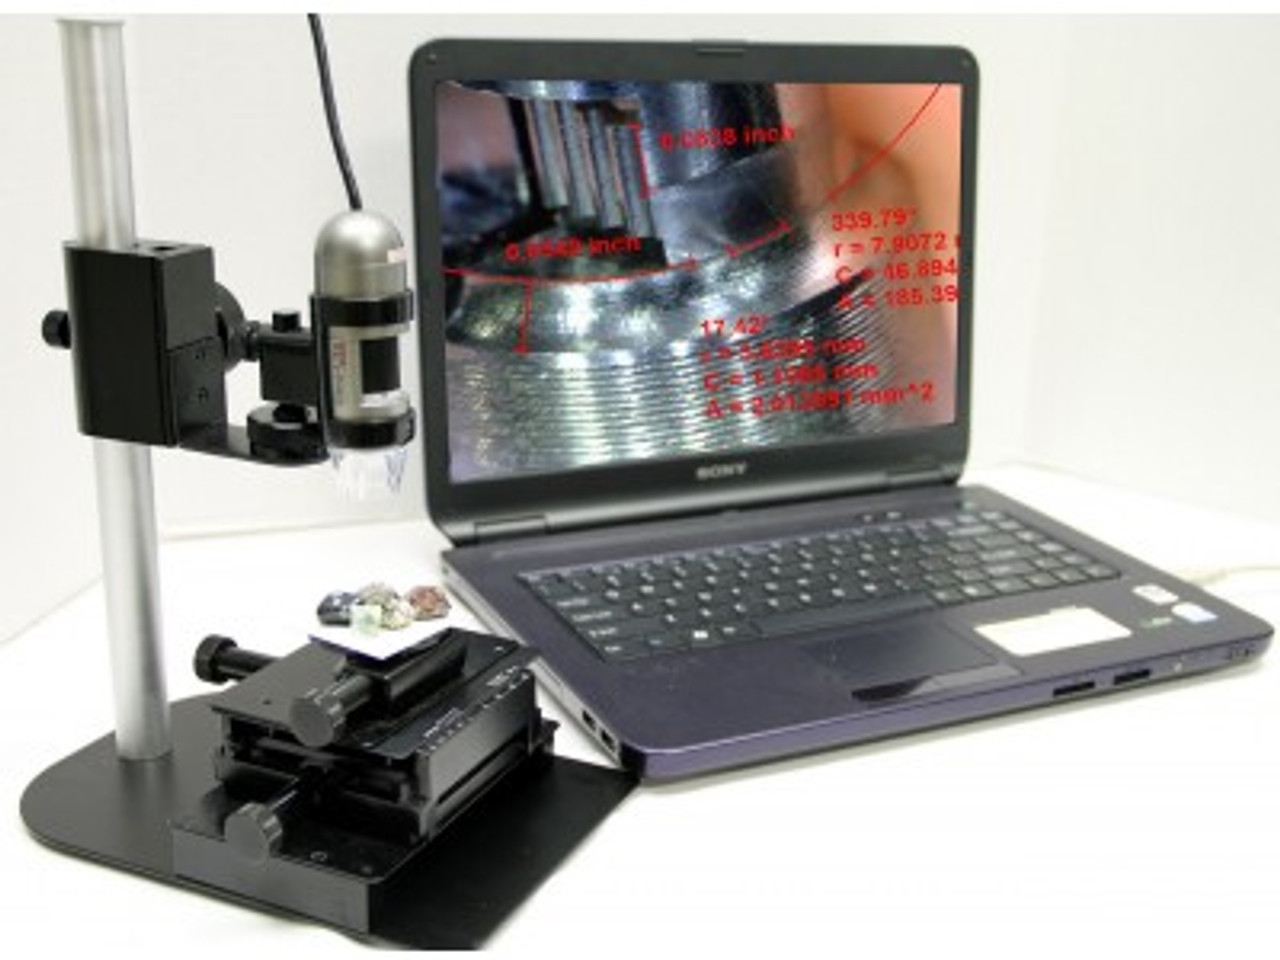 AM4113T Dino-Lite Pro, 10x-50x, 220x, measurement feature (replaces AM413TA)